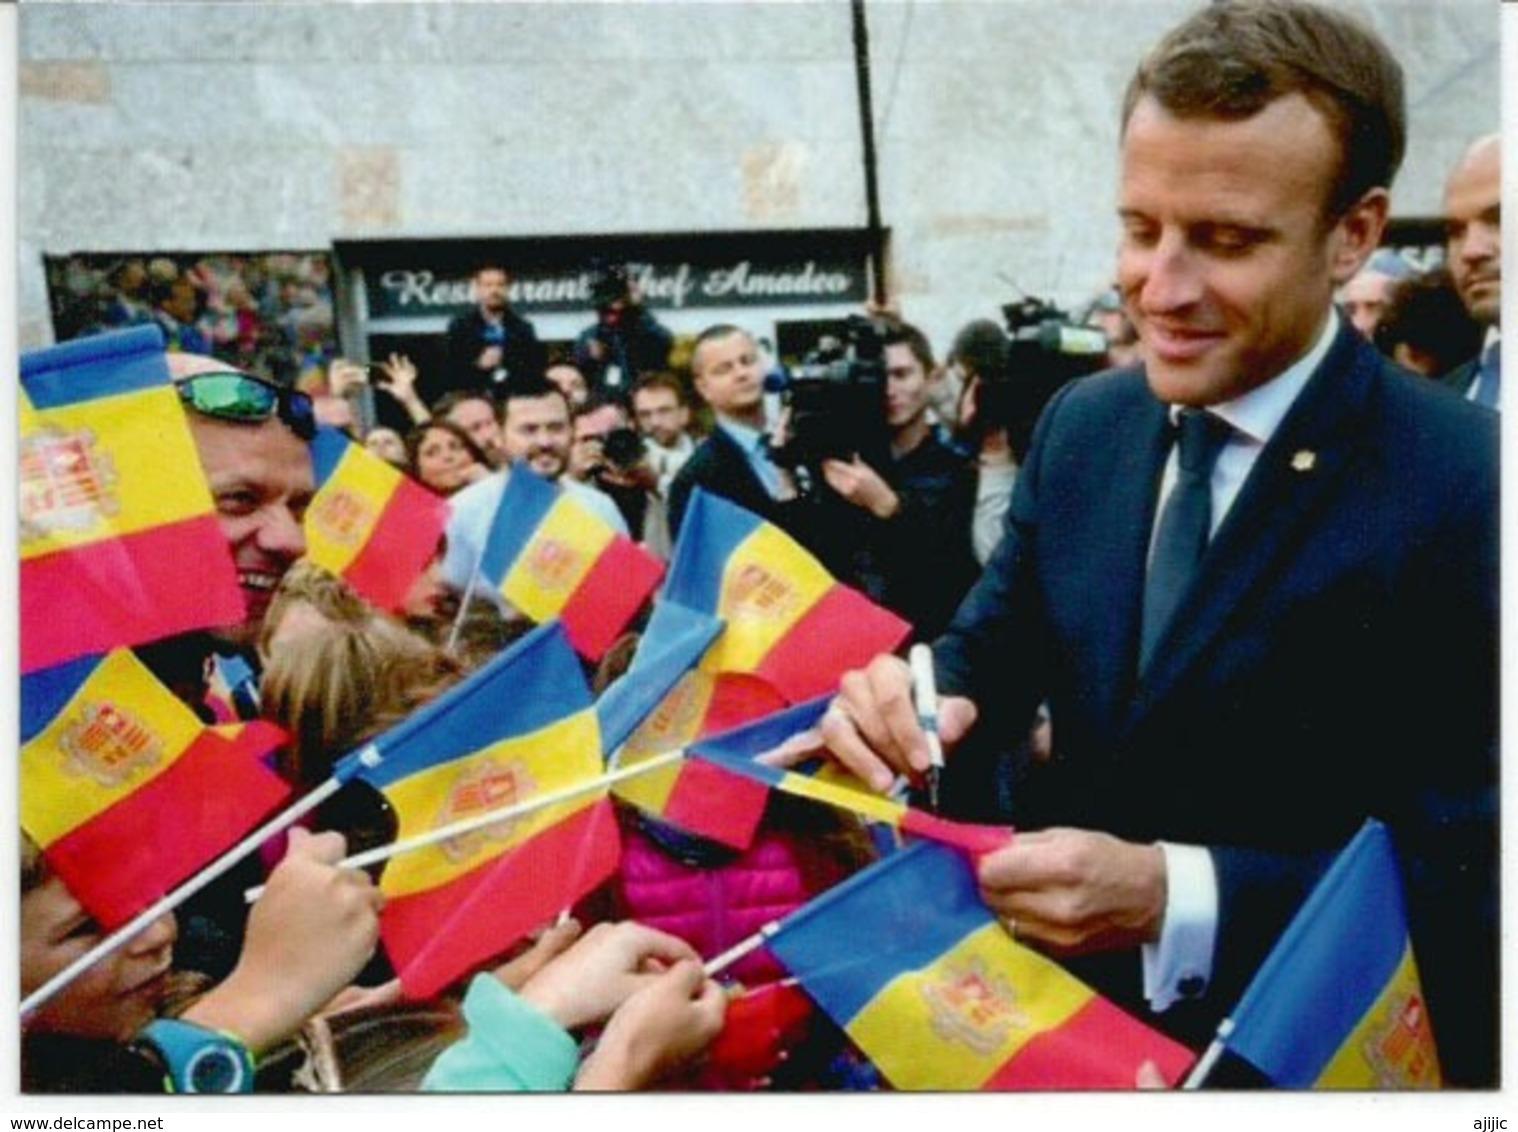 Visite Du President Macron , Co-Prince D'Andorre,  Septembre 2019.  De Gaulle Co-Prince Au Dos, Avec Cachet Andorre - French Andorra